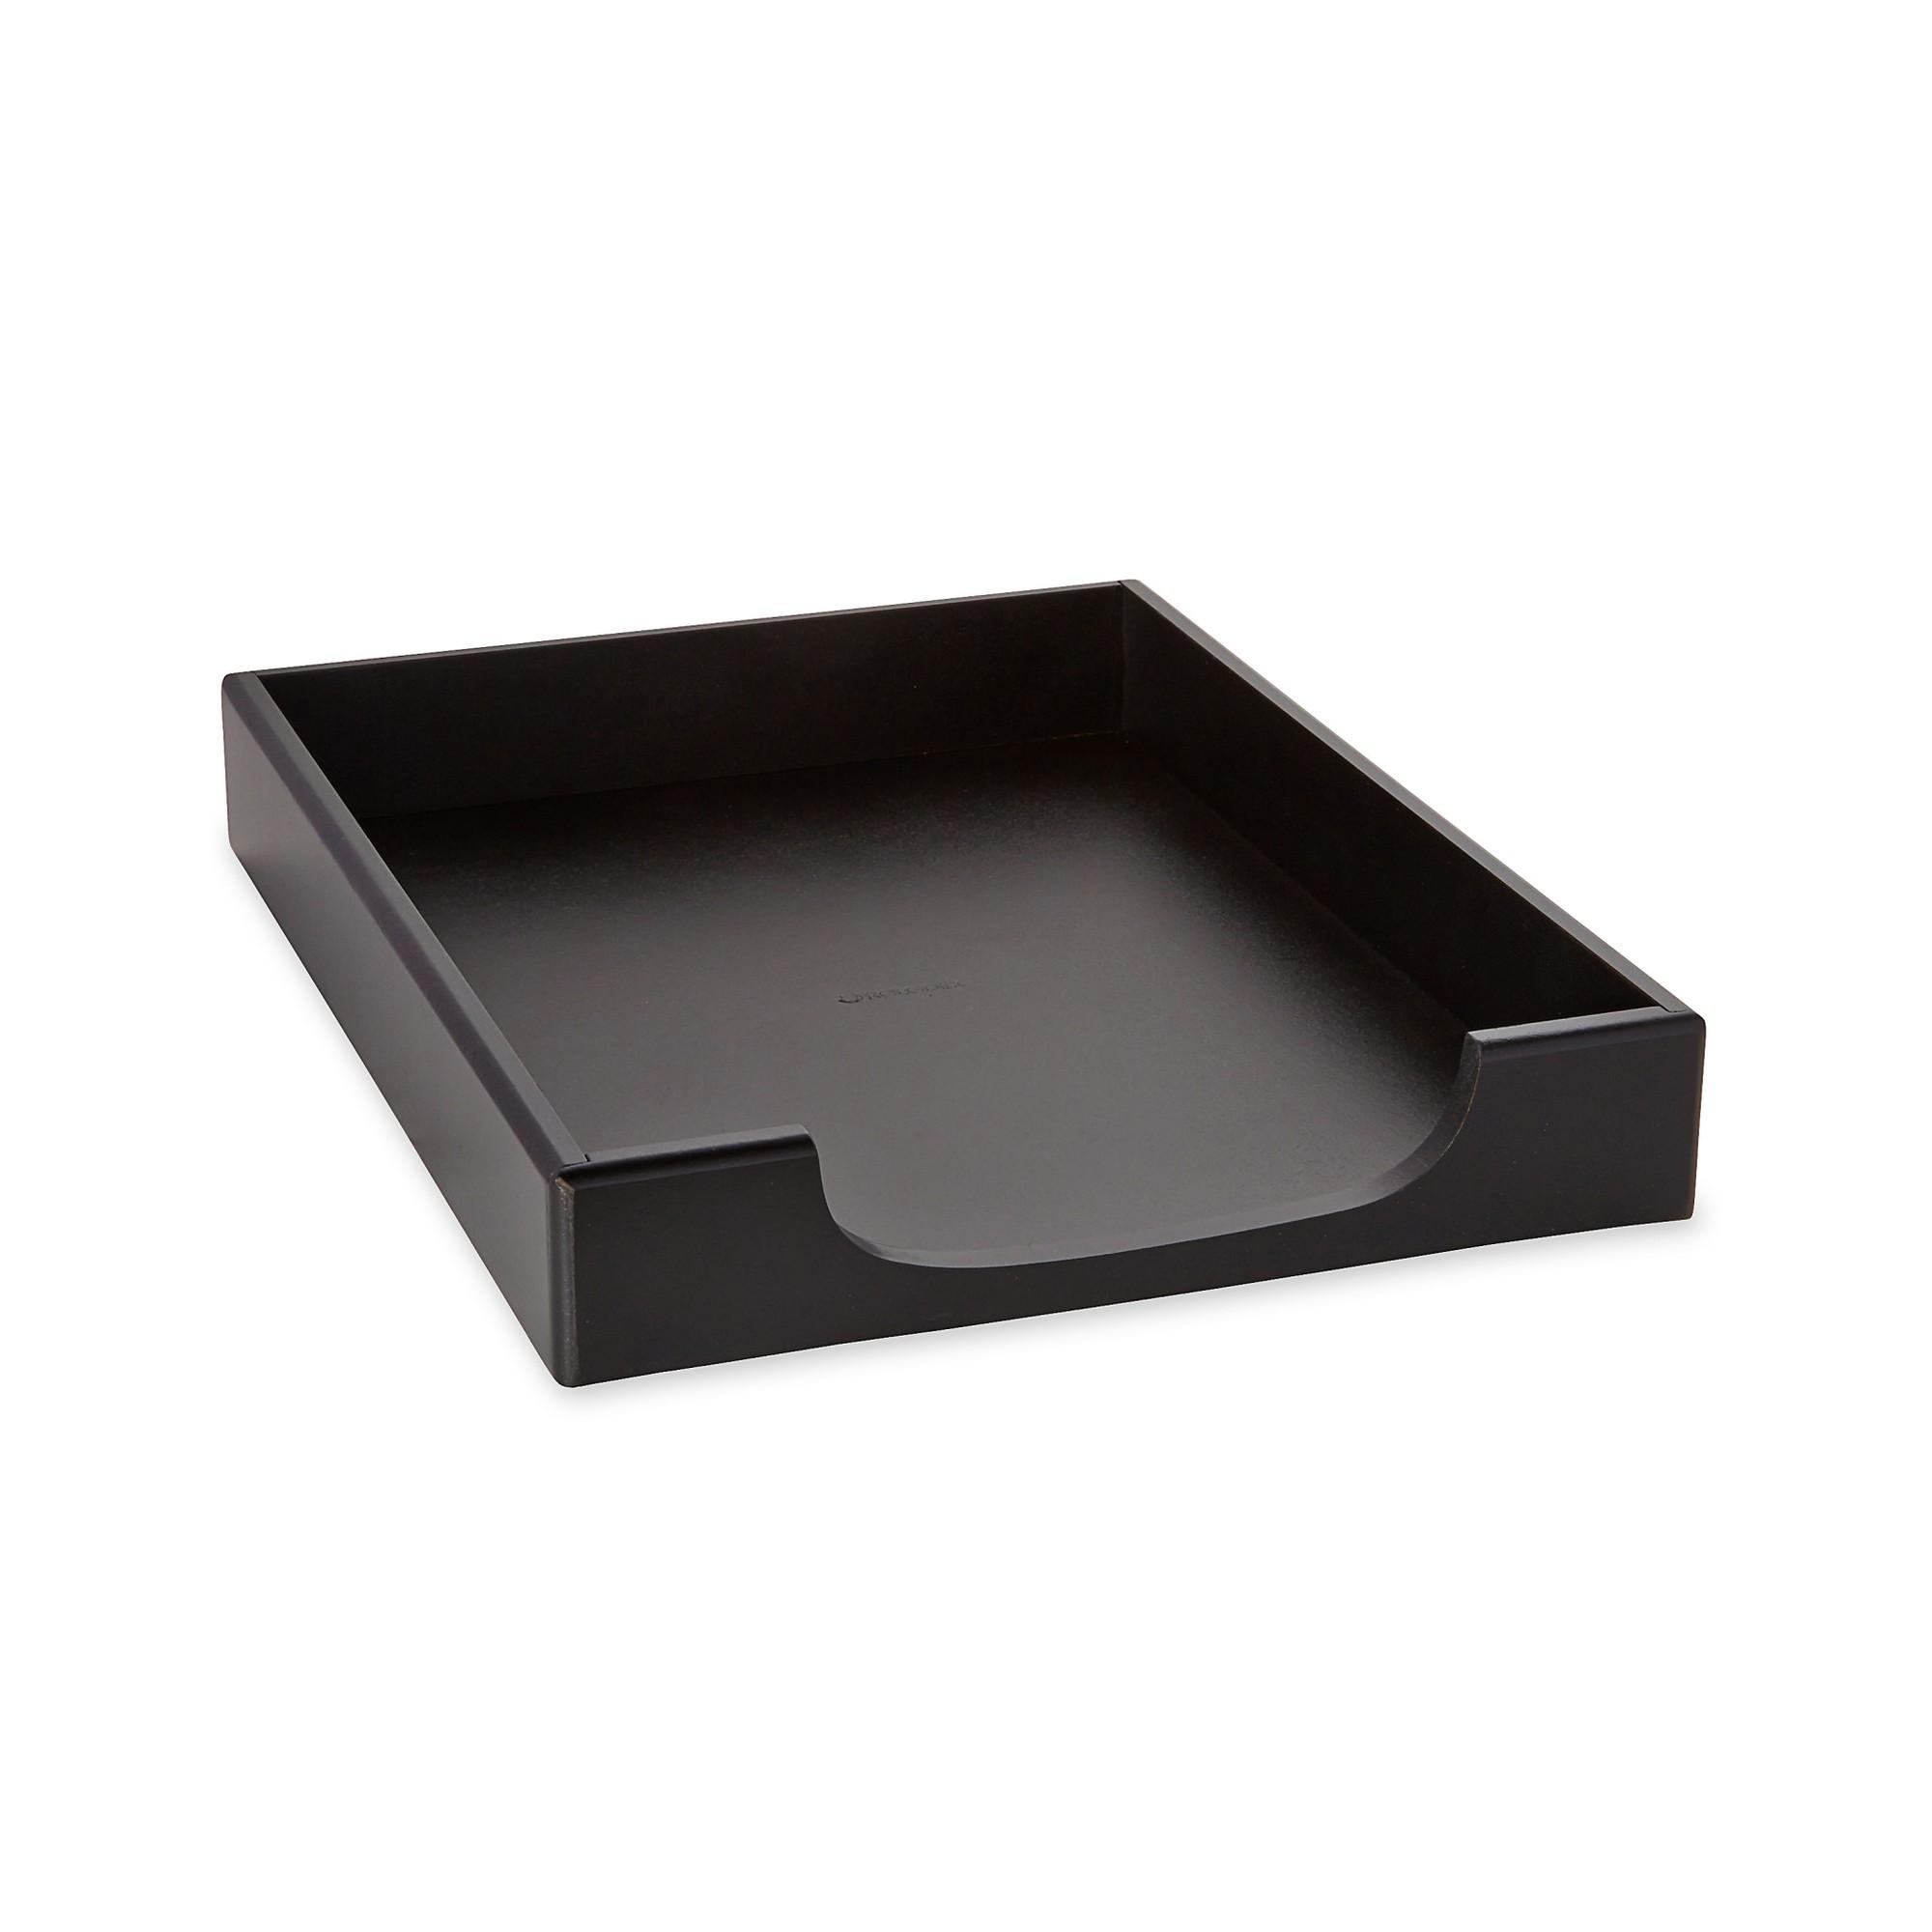 Wood Tones Letter Desk Tray, Wood, Black